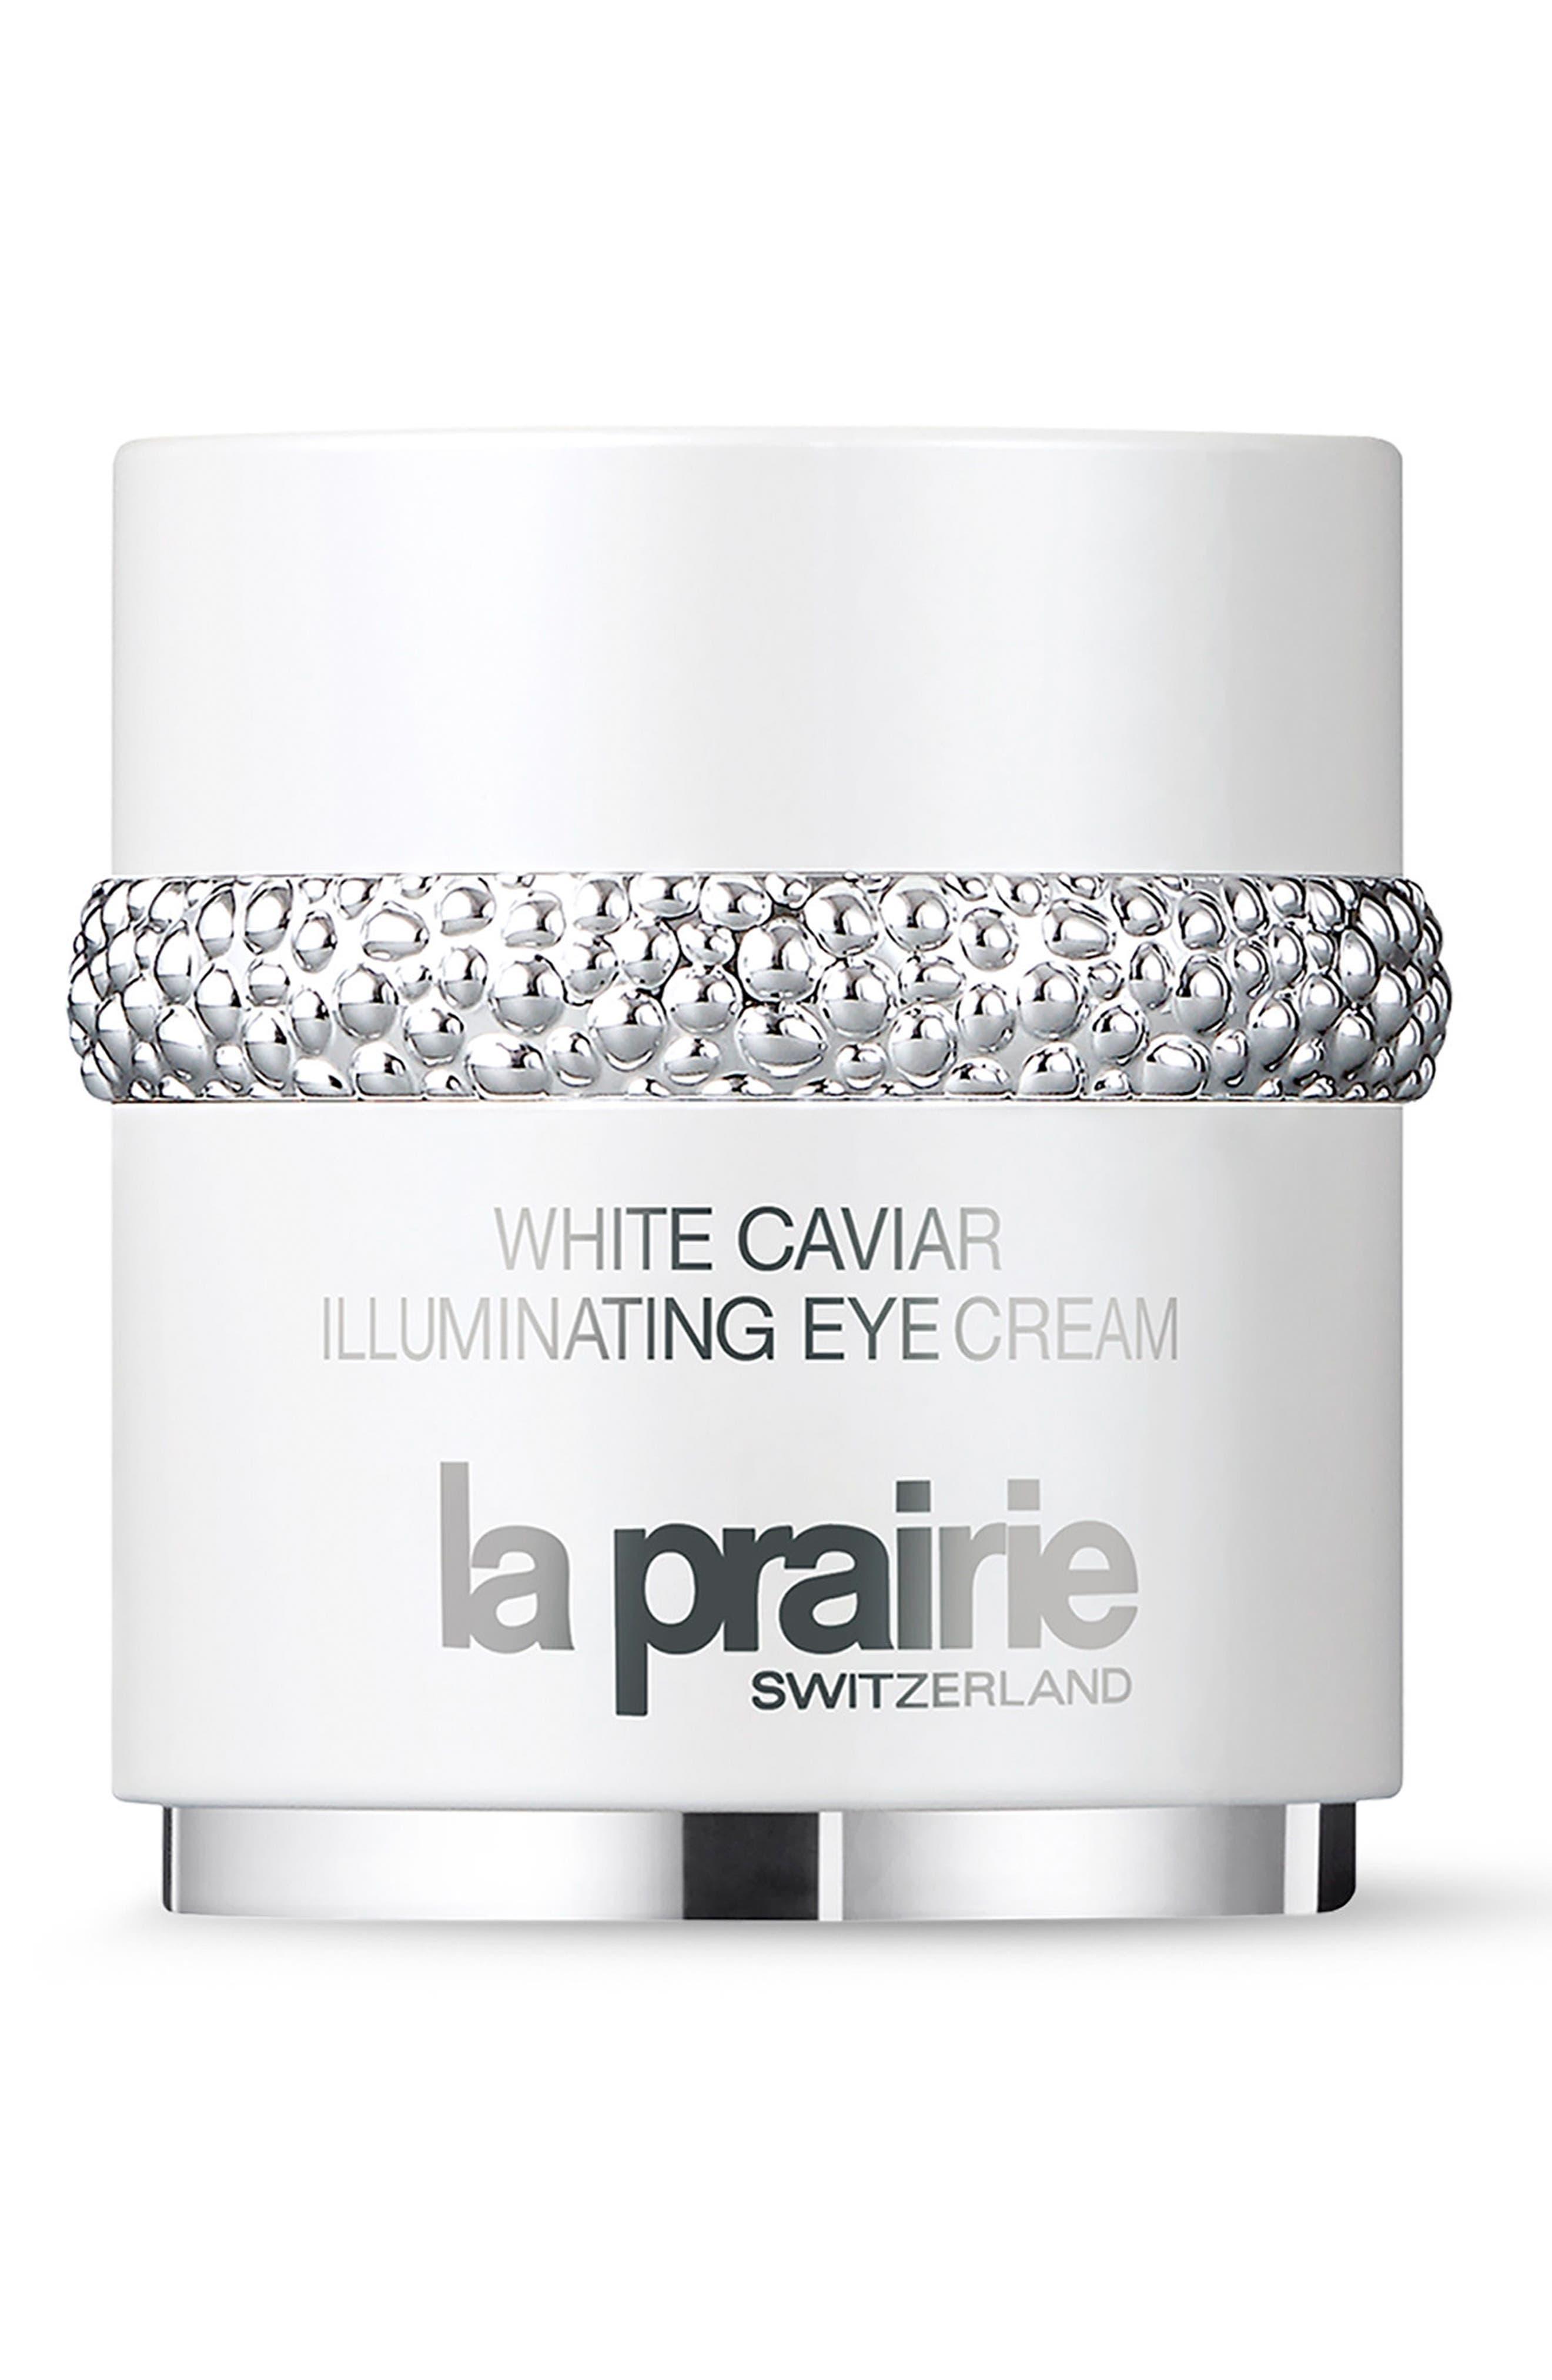 White Caviar Illuminating Eye Cream,                             Main thumbnail 1, color,                             NO COLOR